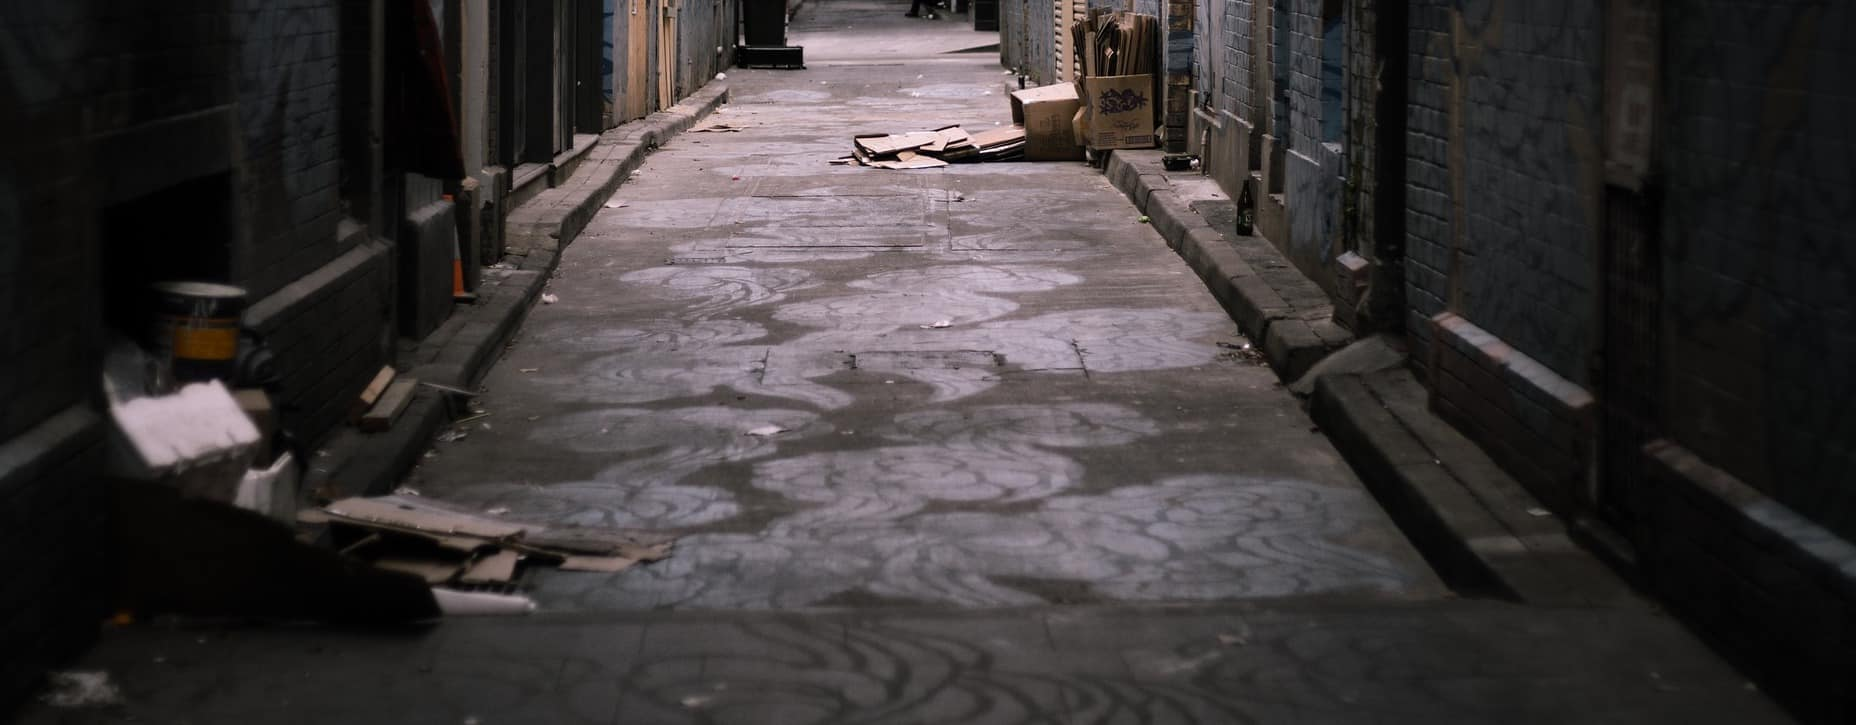 Jack Kerouac Alley- A Unique, Underrated Part of San Francisco